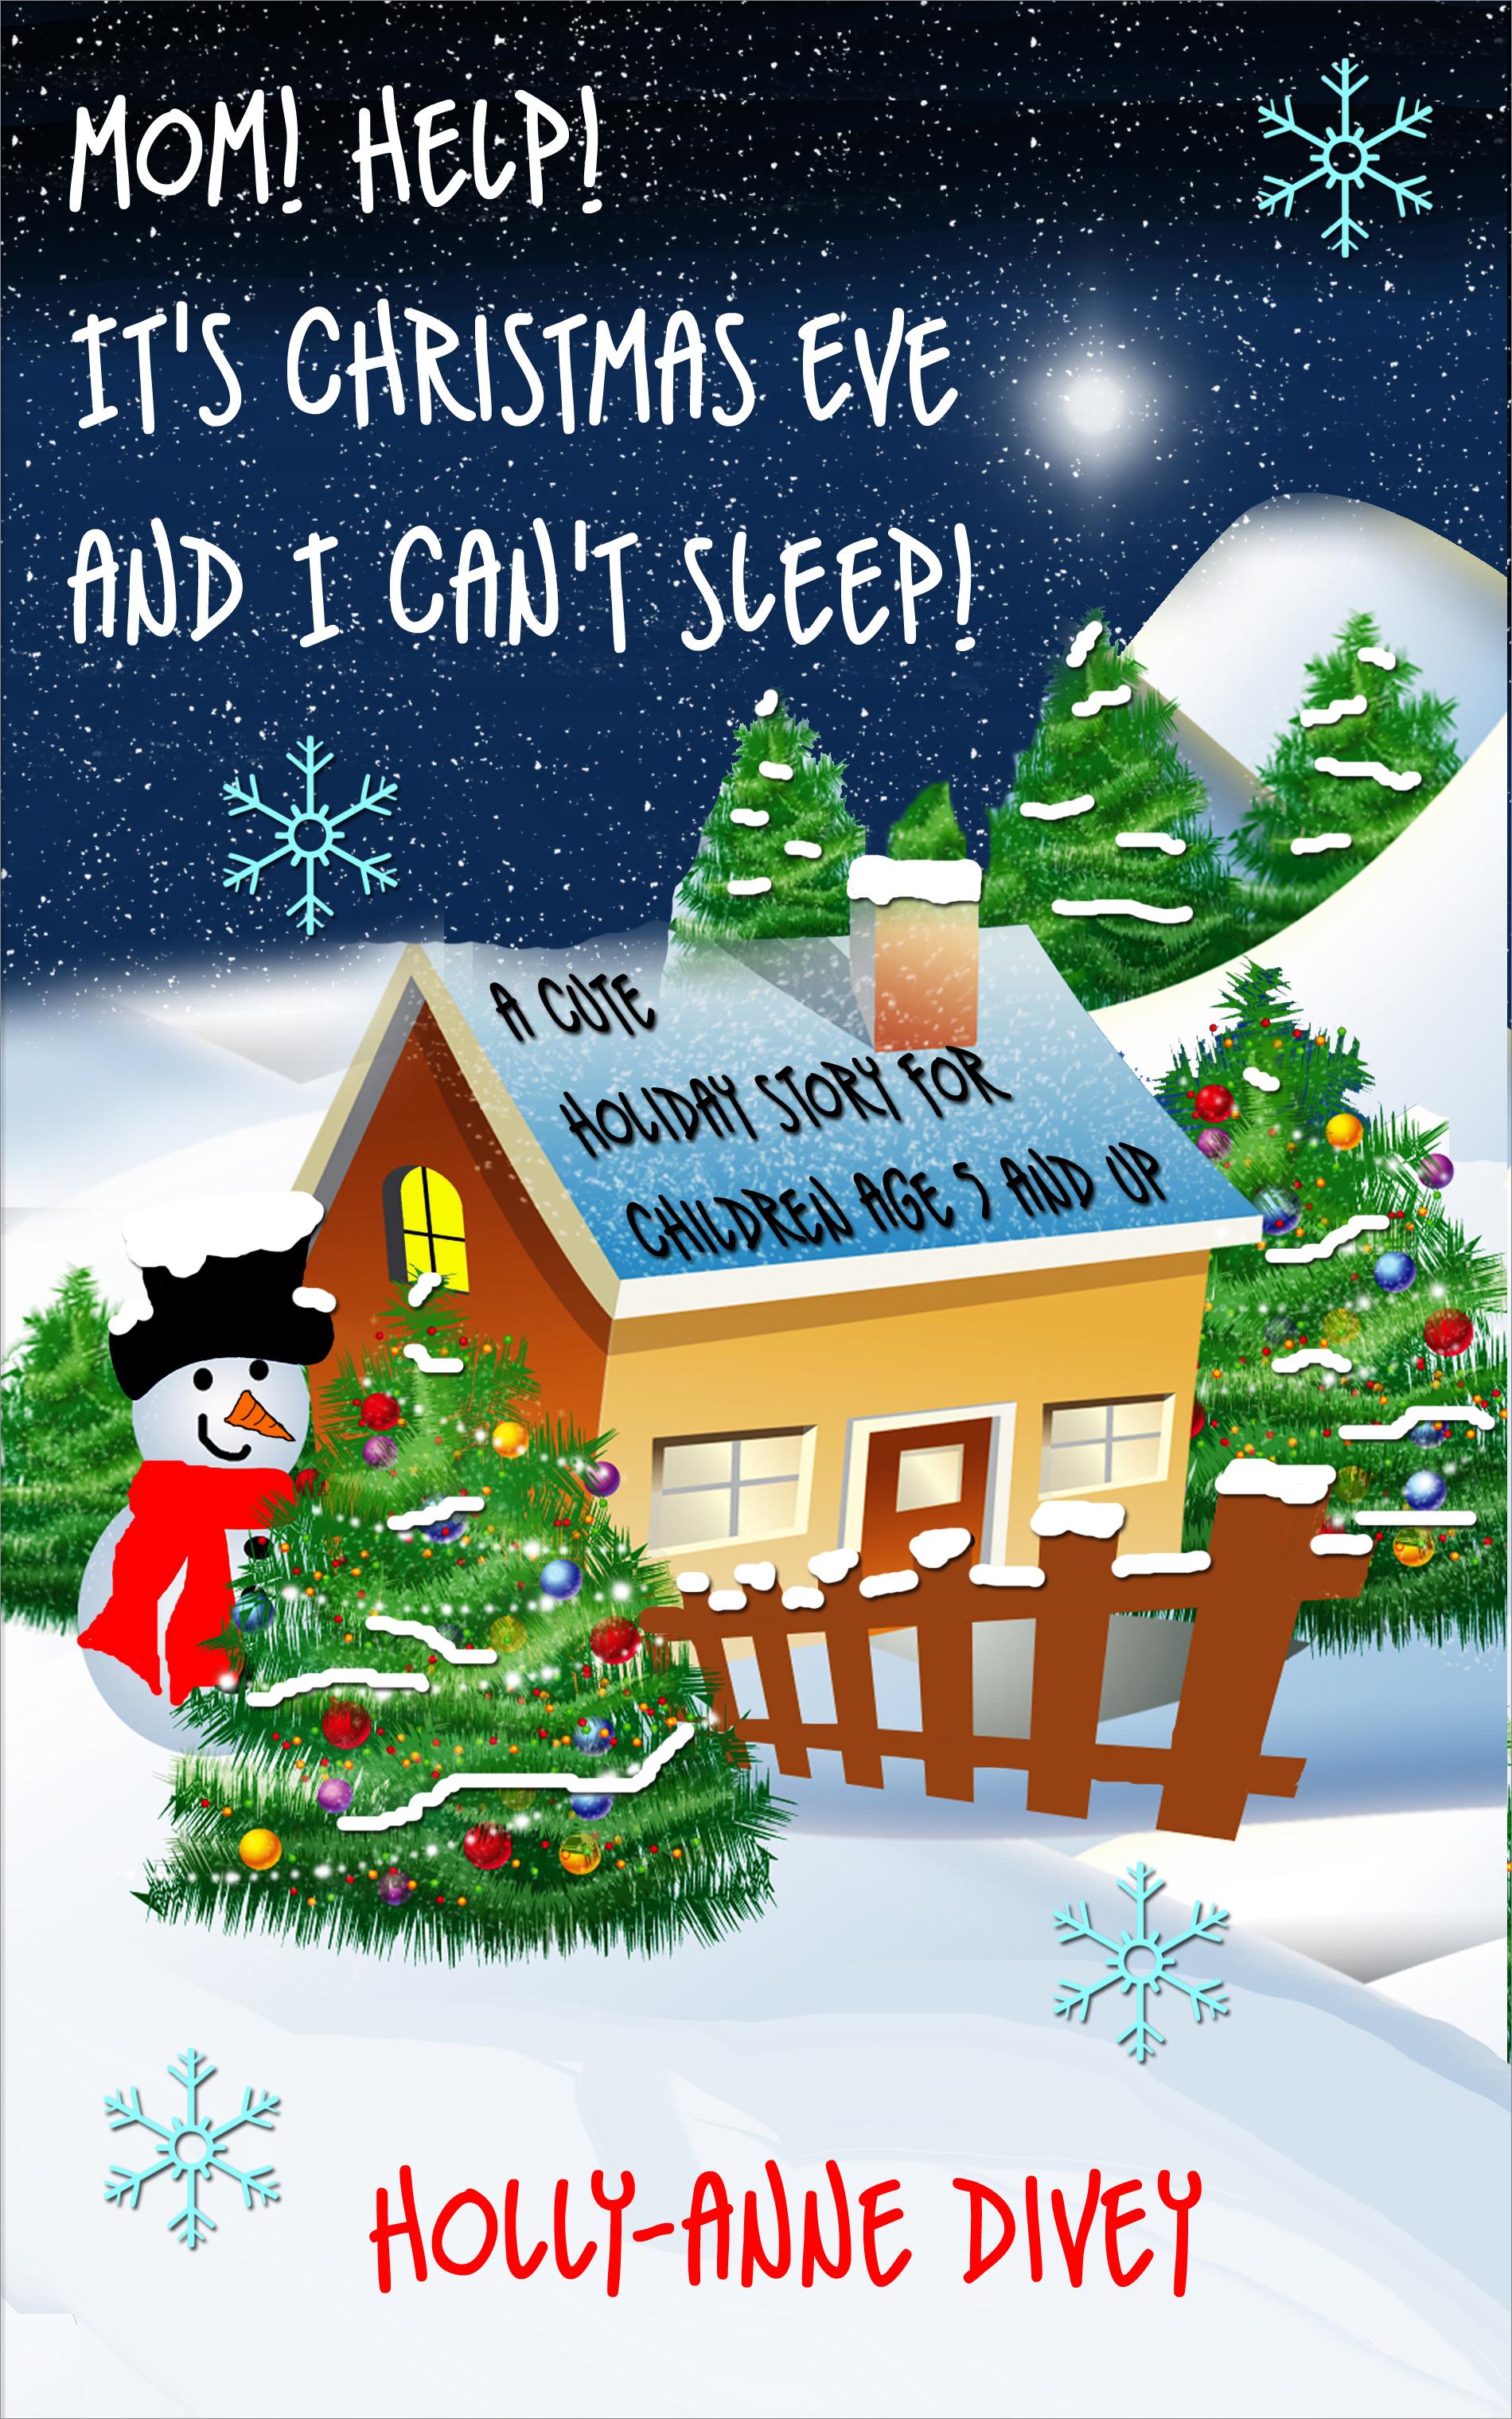 mom help its christmas eve - How To Go To Sleep On Christmas Eve